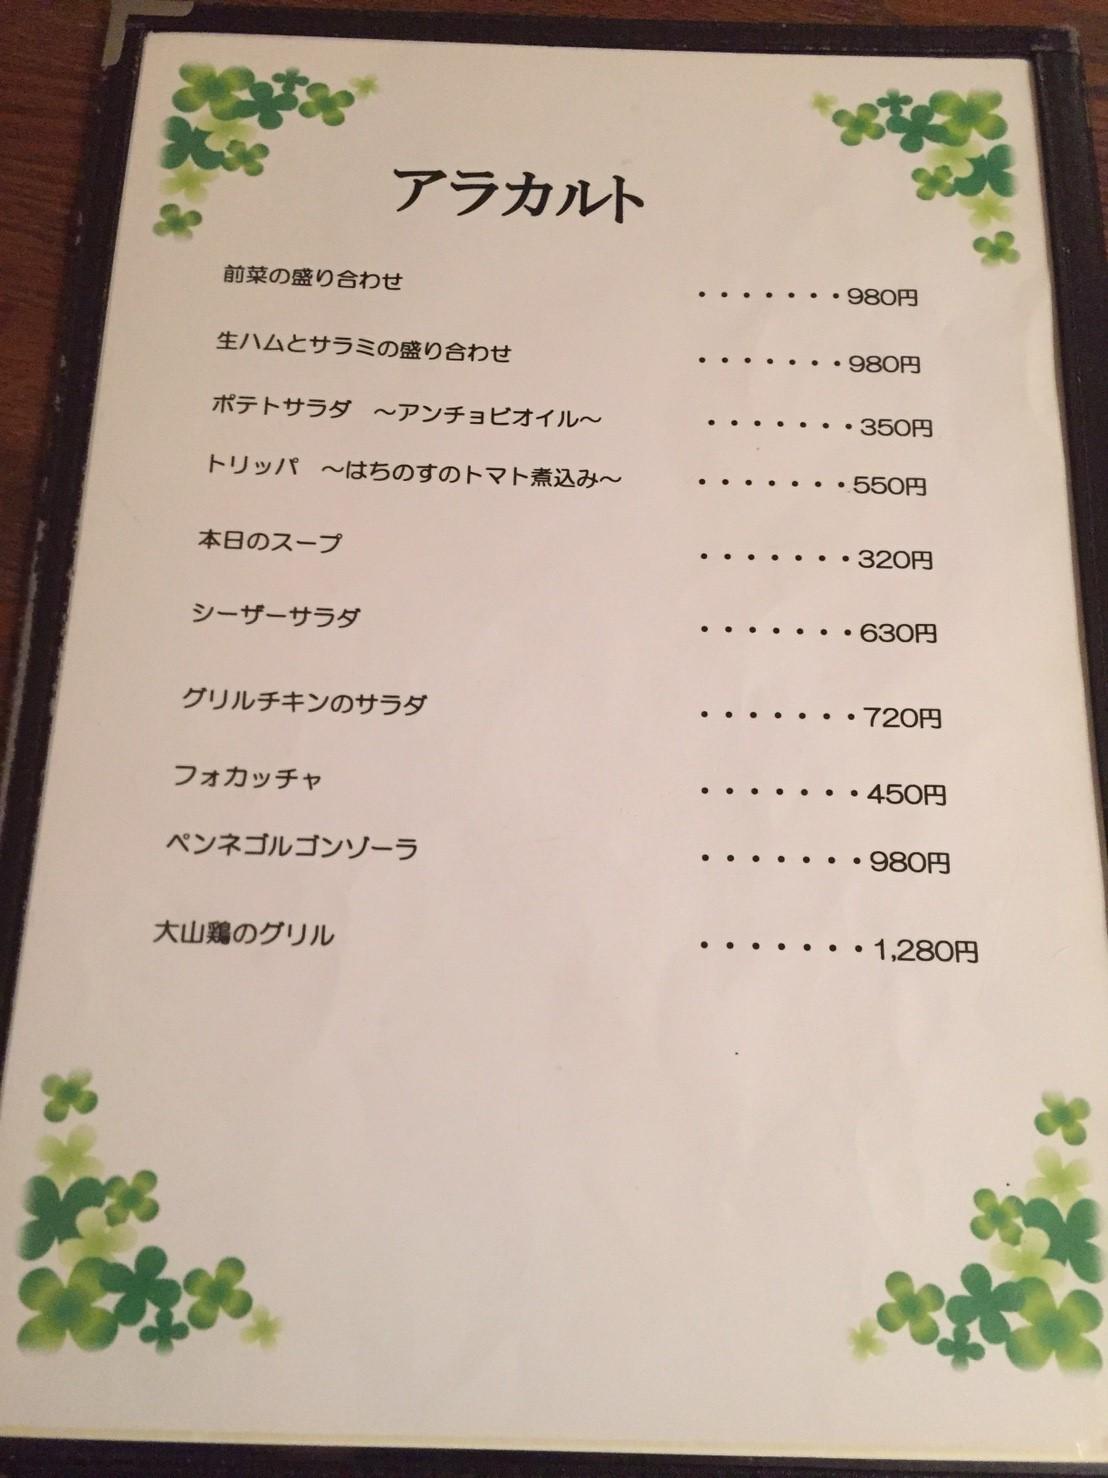 Pizzeria Sanare 取り分けディナー_e0115904_05242252.jpg